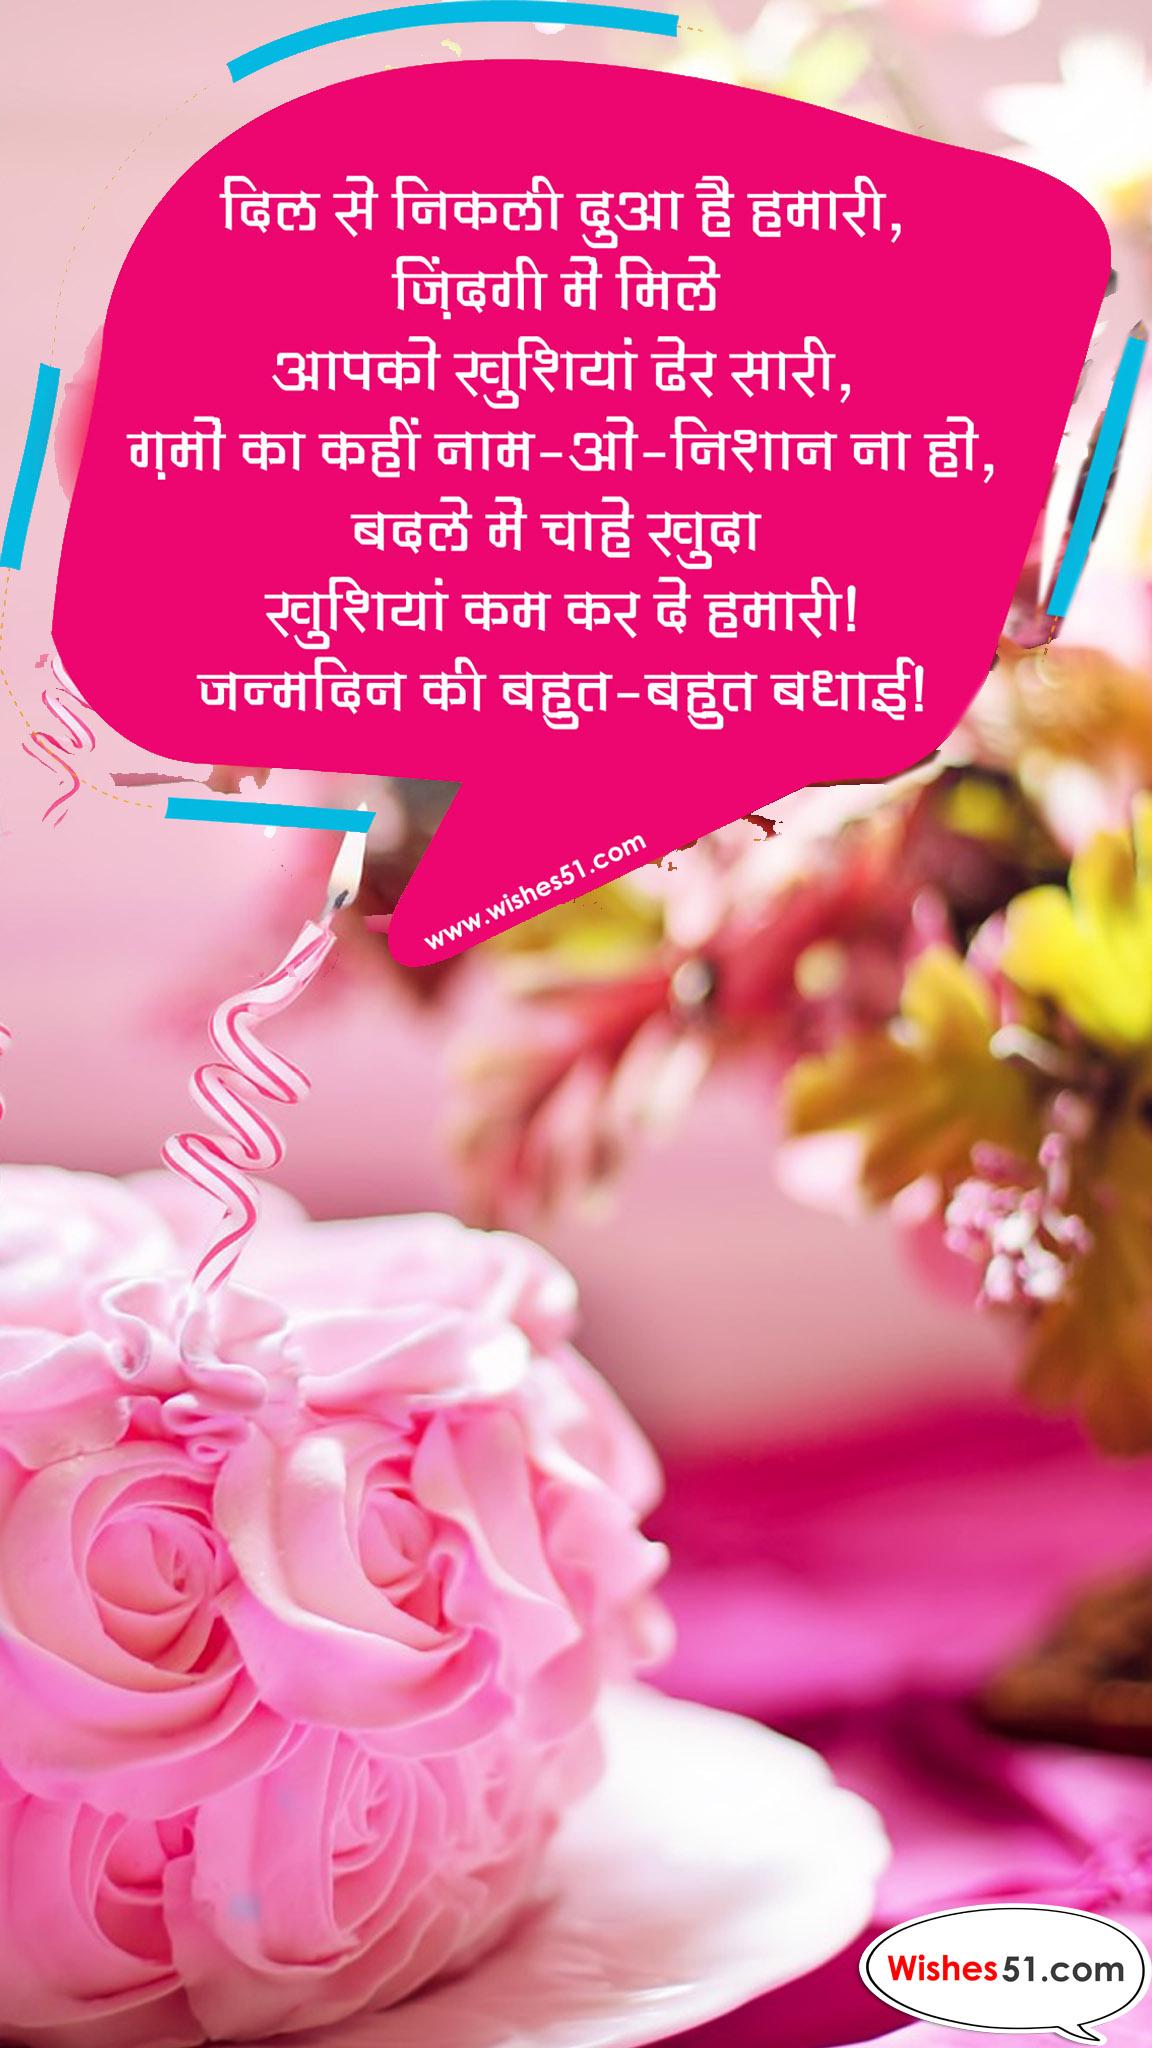 Top 5 Happy Birthday Wishes in Hindi | Best Happy Birthday